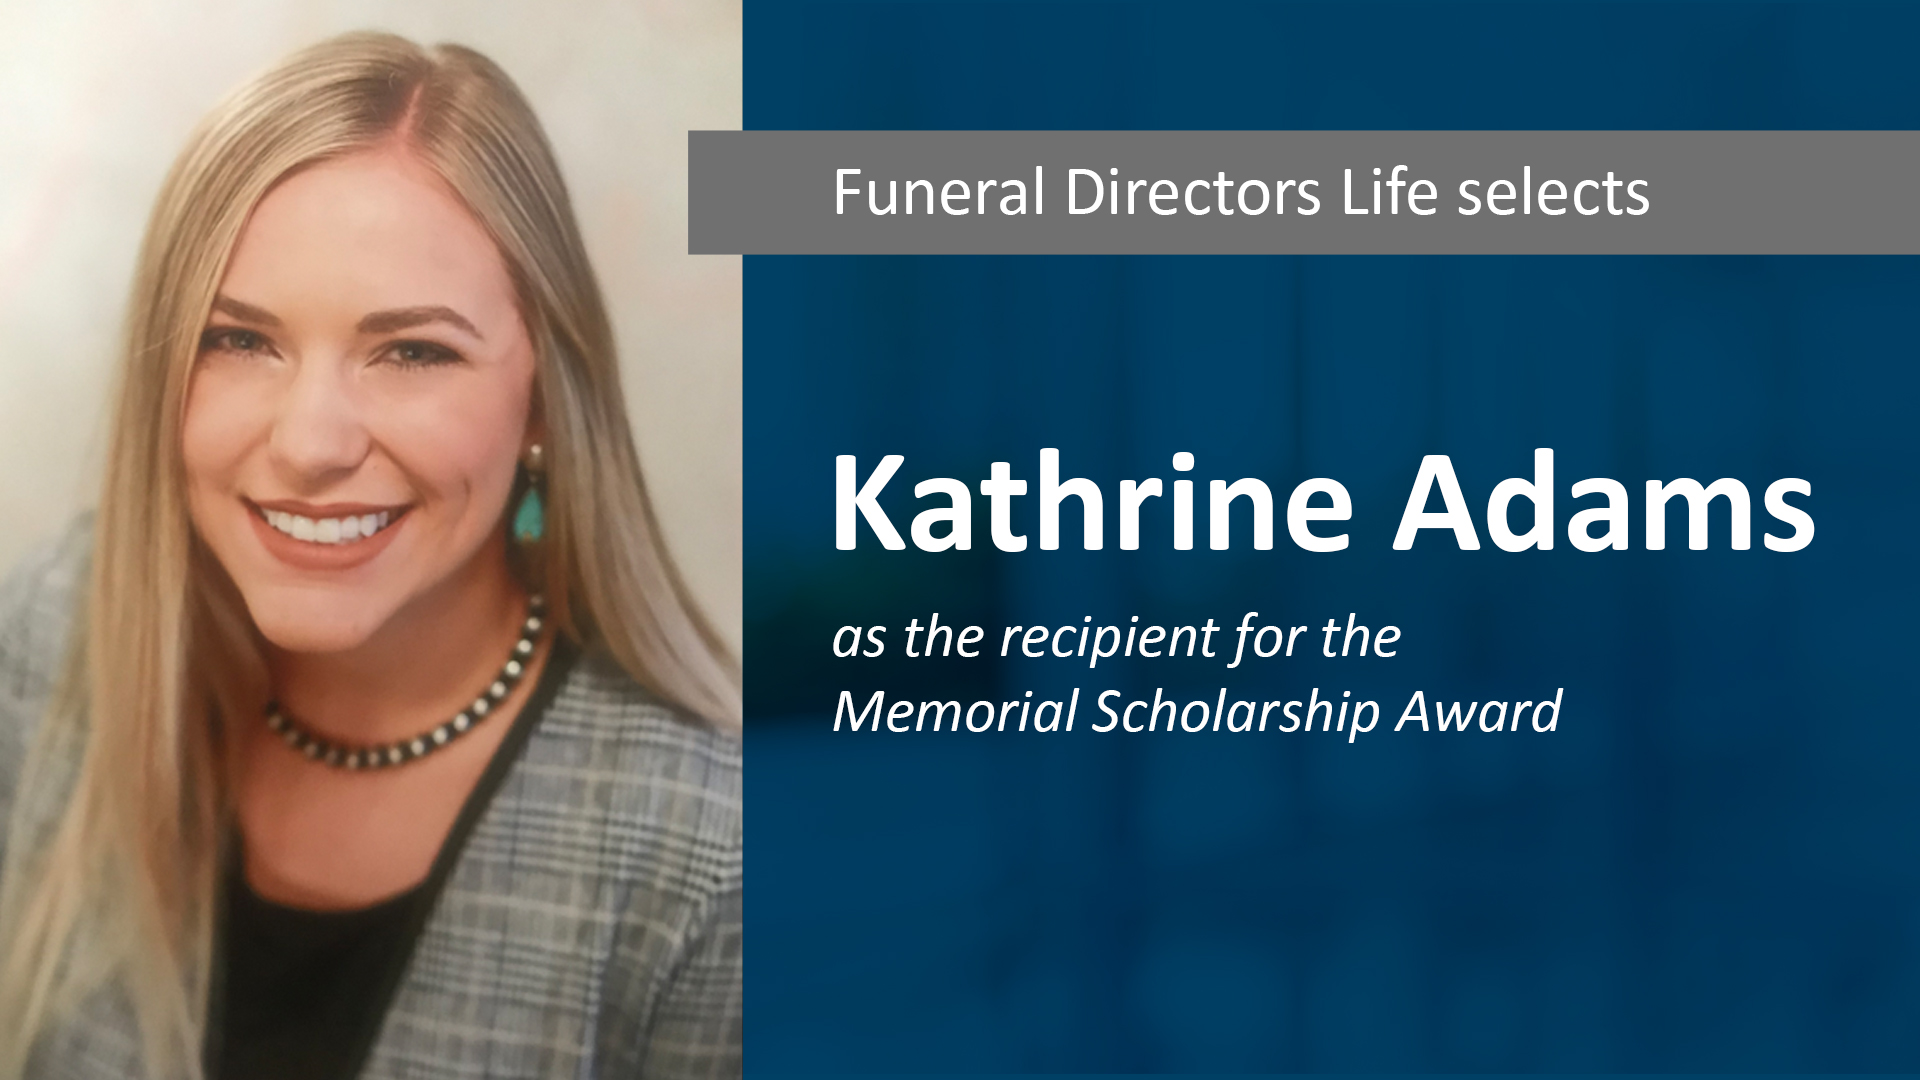 FDLIC Selects Kathrine Adams for the Memorial Scholarship Award